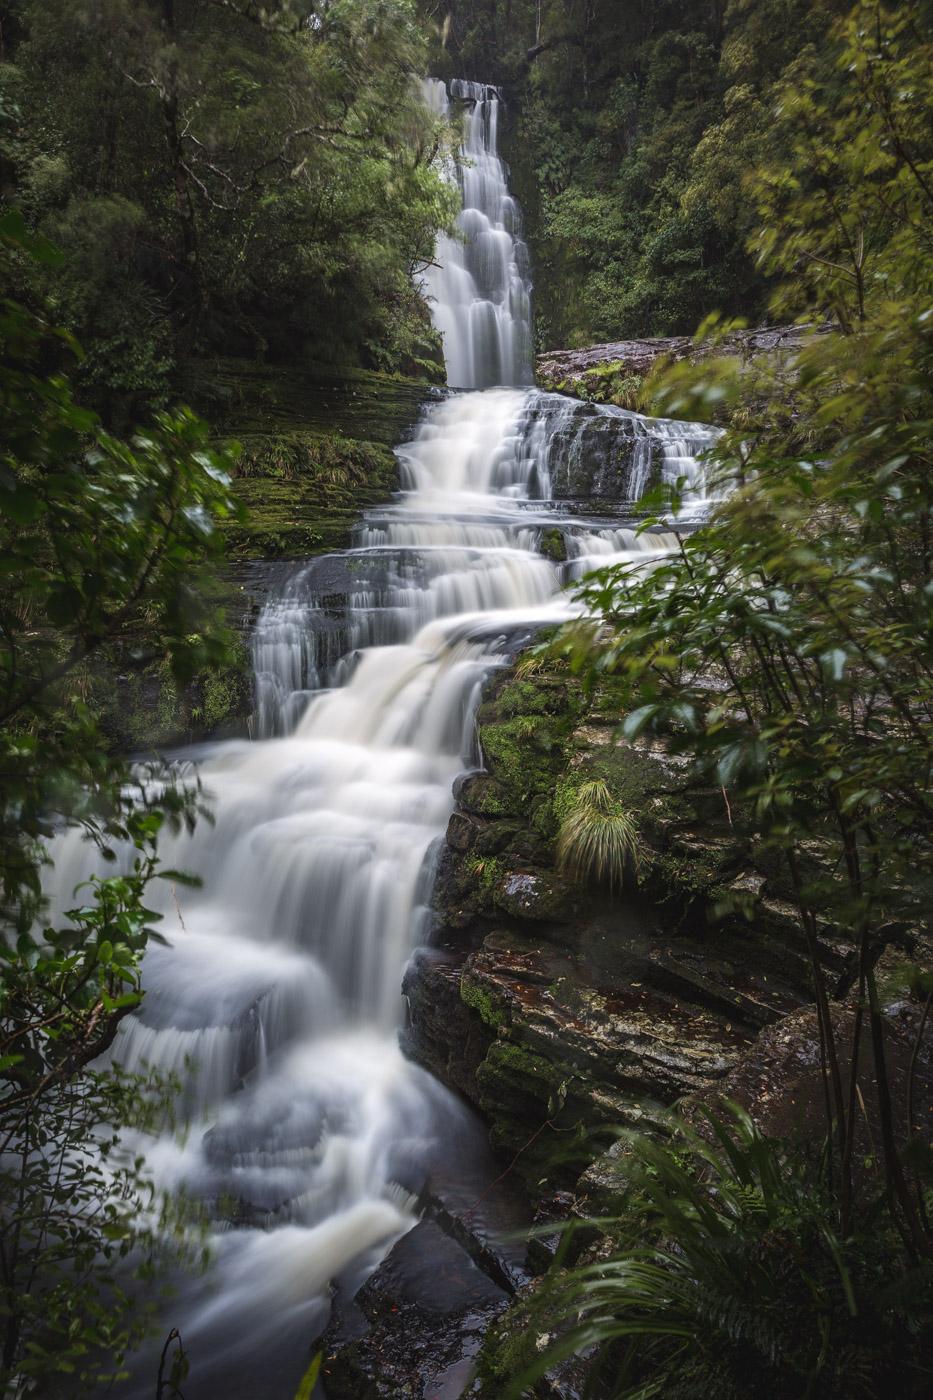 McClean Falls, South Island, New Zealand